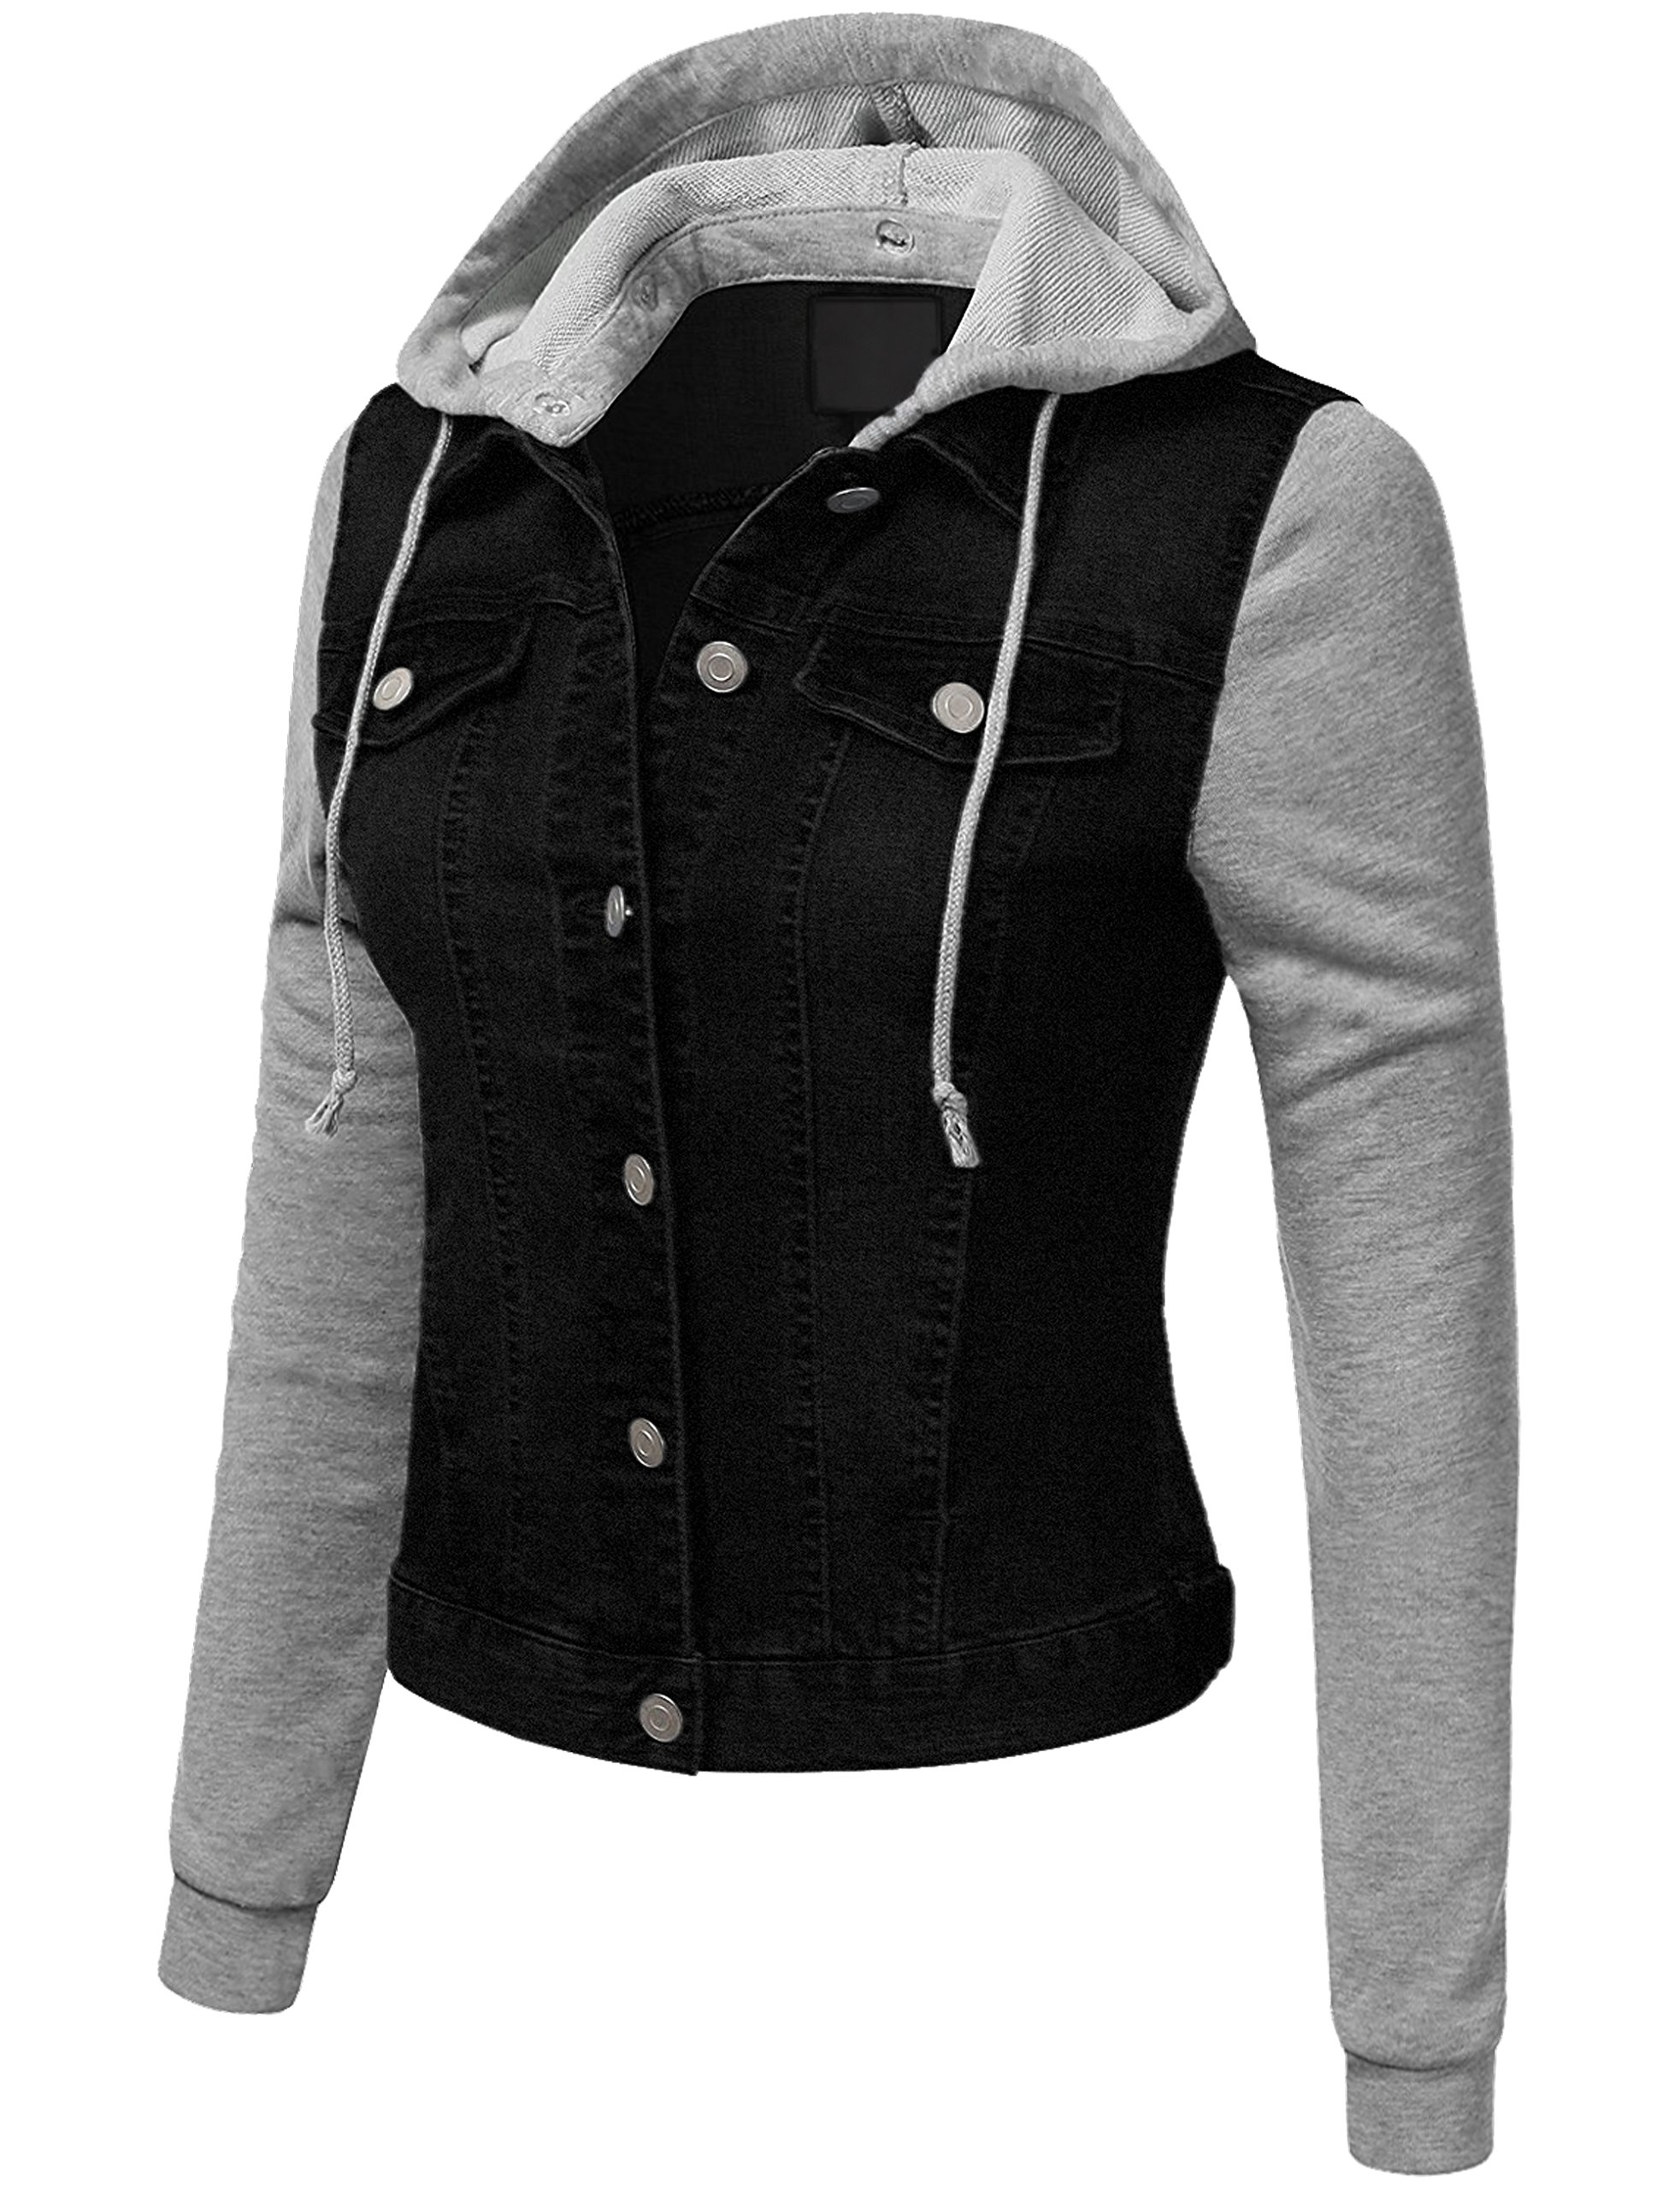 KOOLDO Womens Denim Jacket Lightweight Fleece Hoodie, Sleeve and Pockets-S-Black